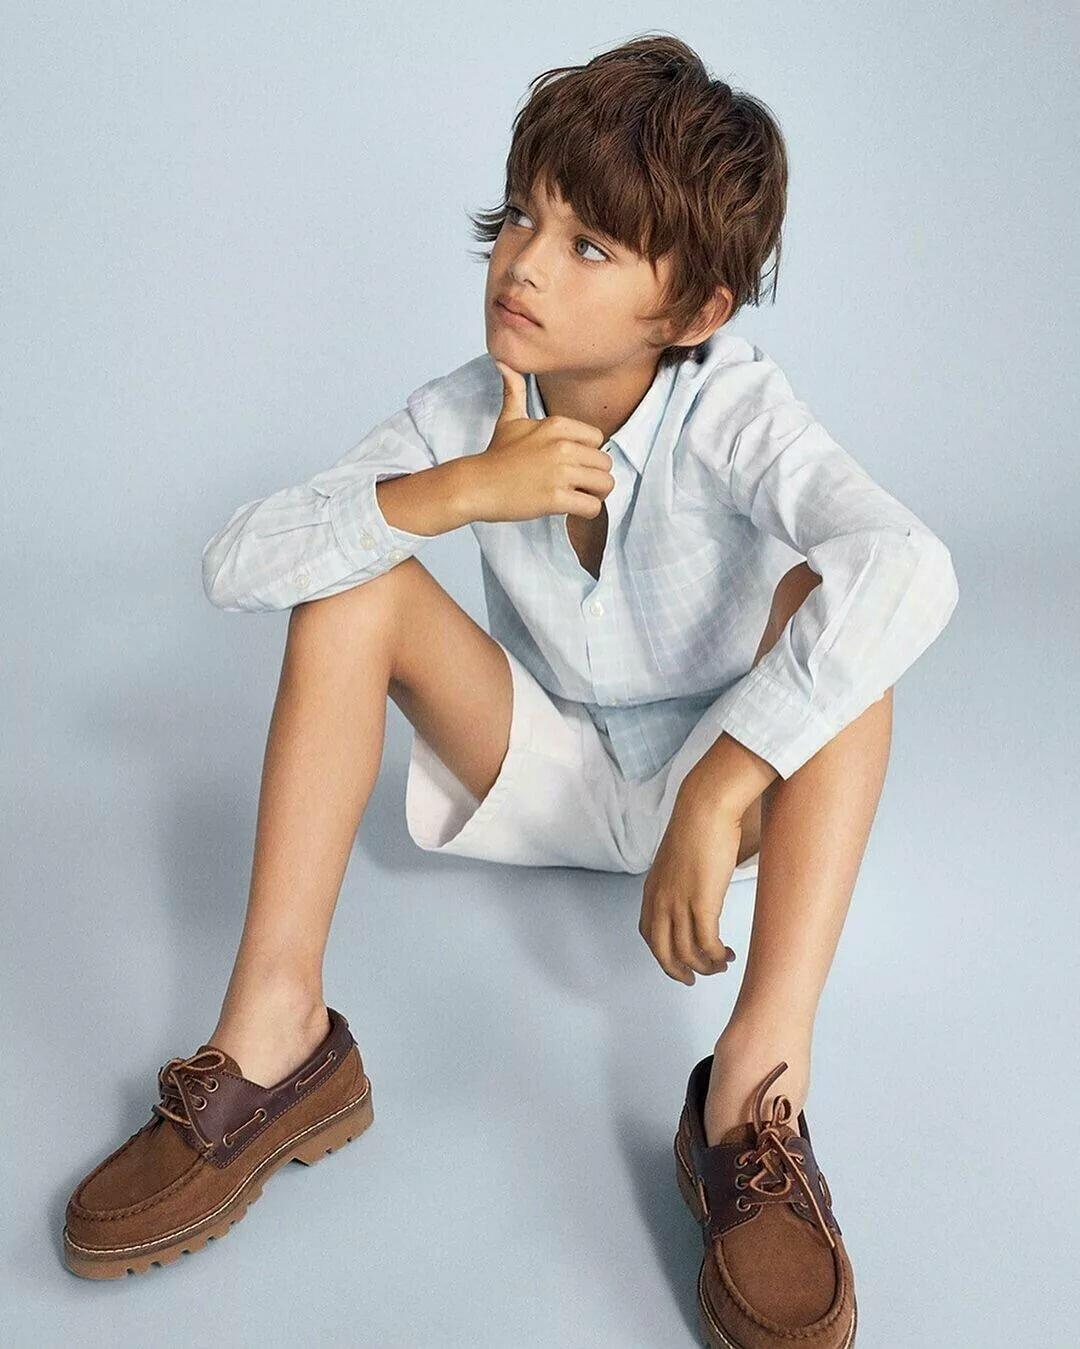 Youngest little boys girls models